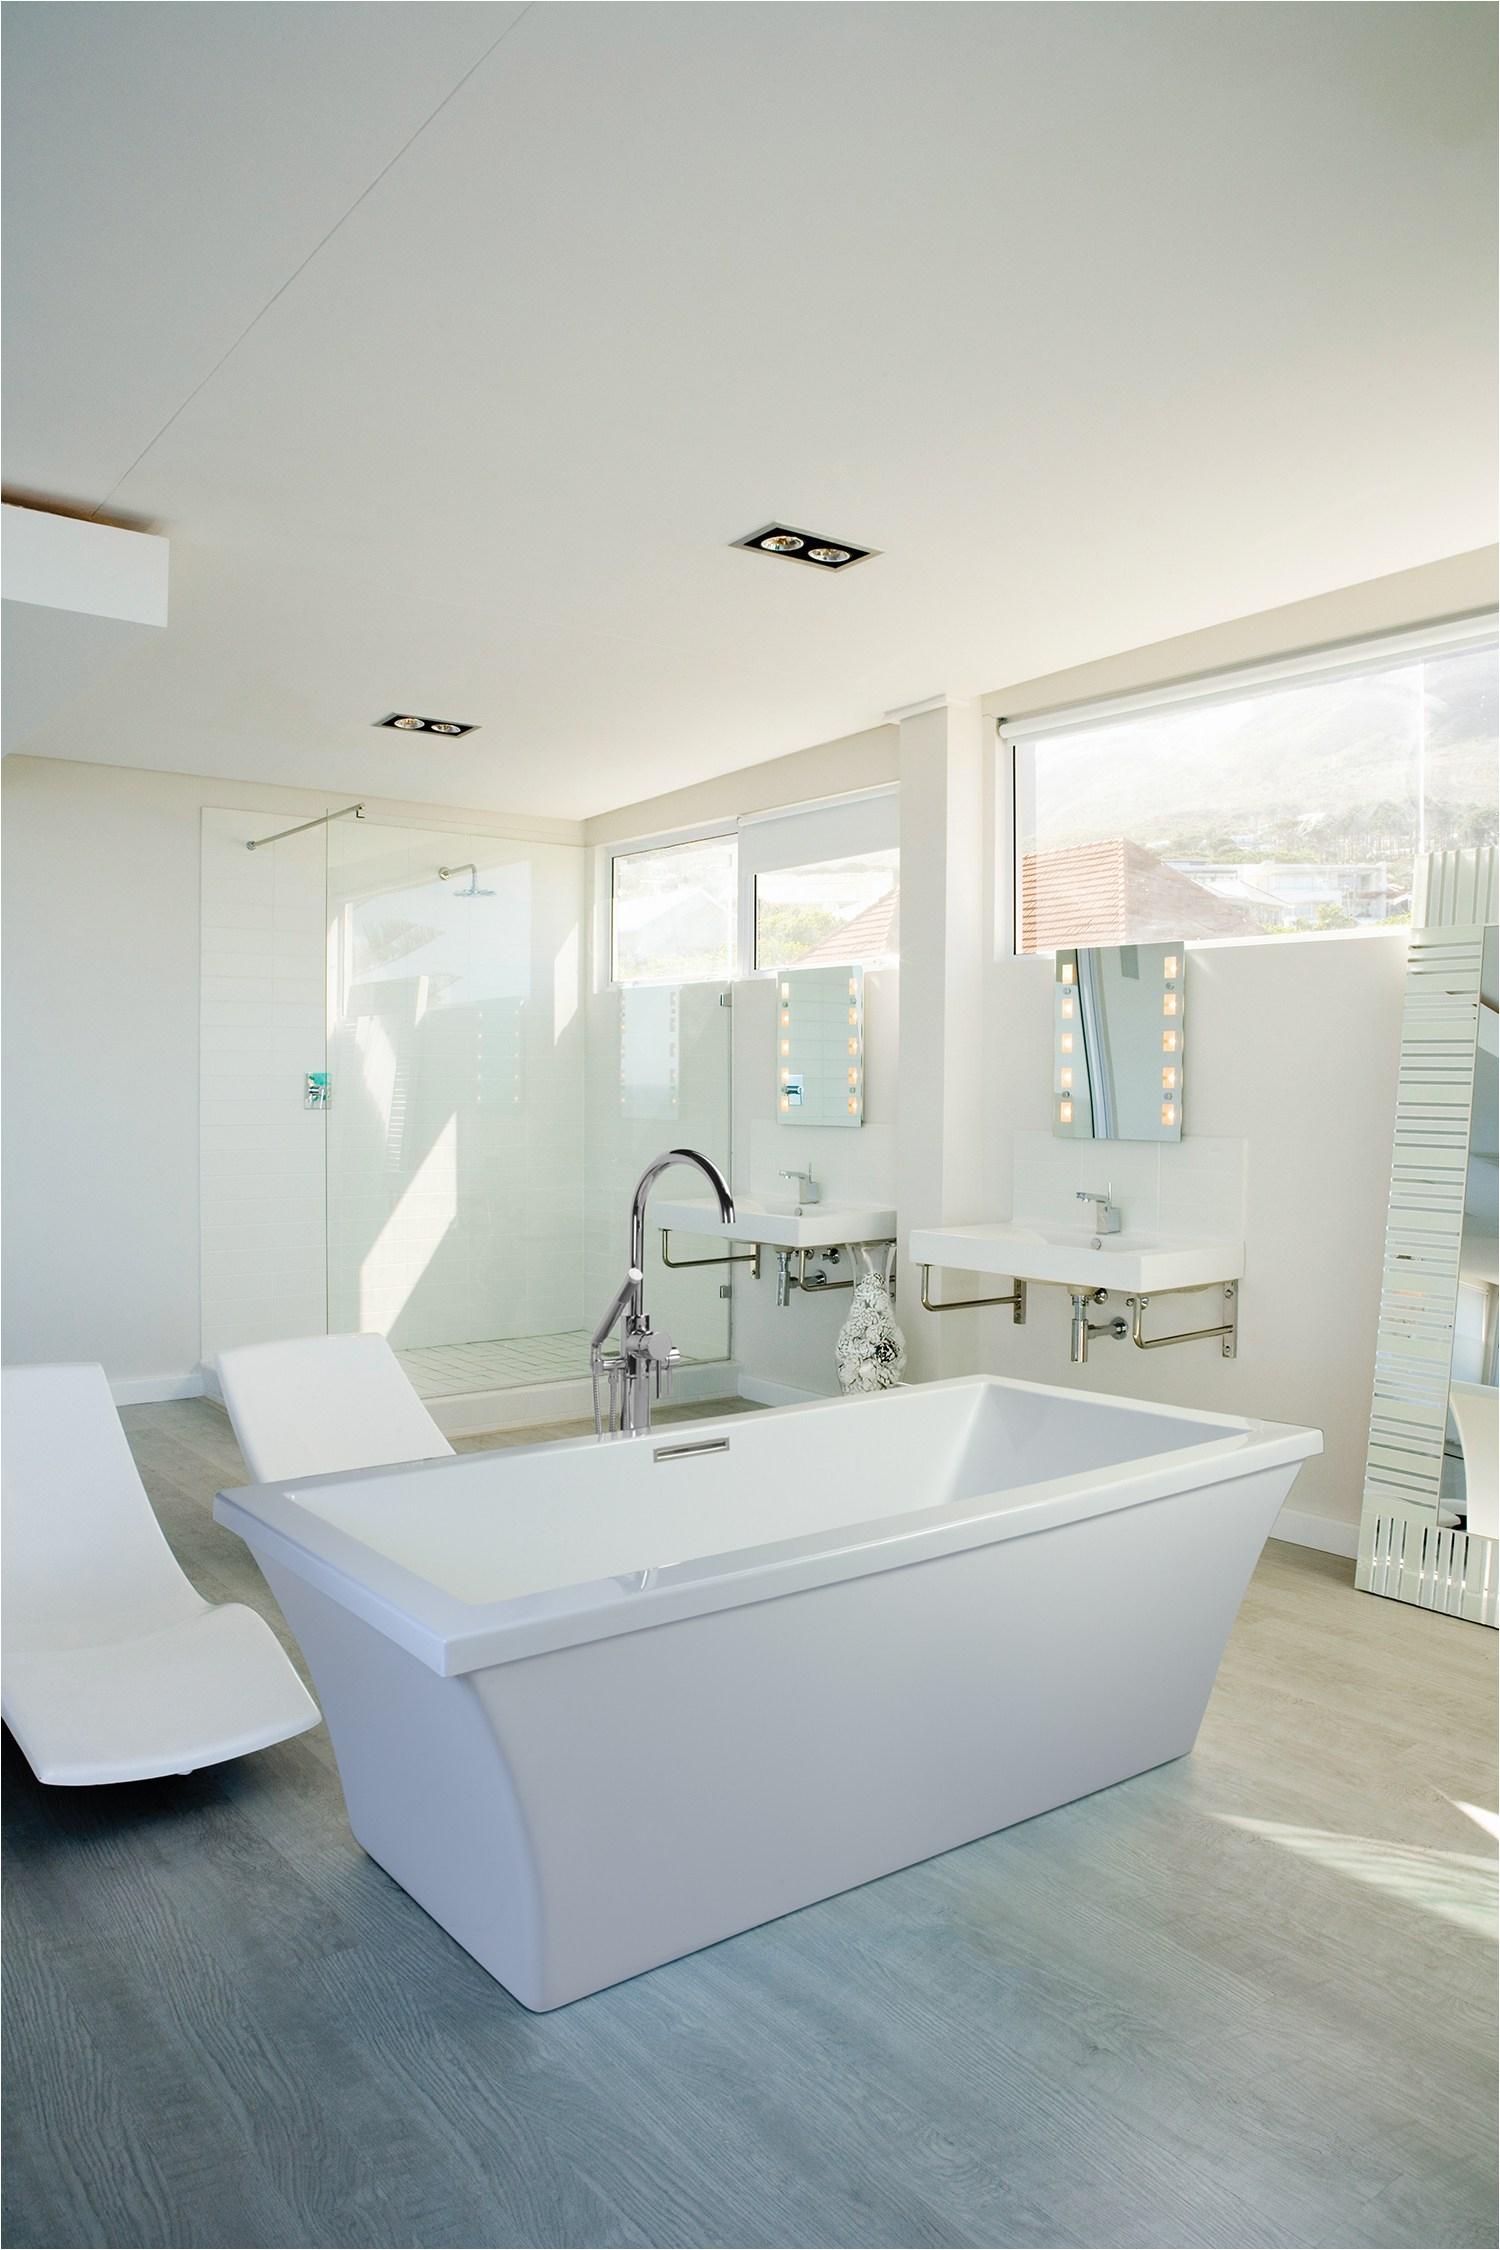 photo courtesy mti available at ferguson bath kitchen lighting gallery